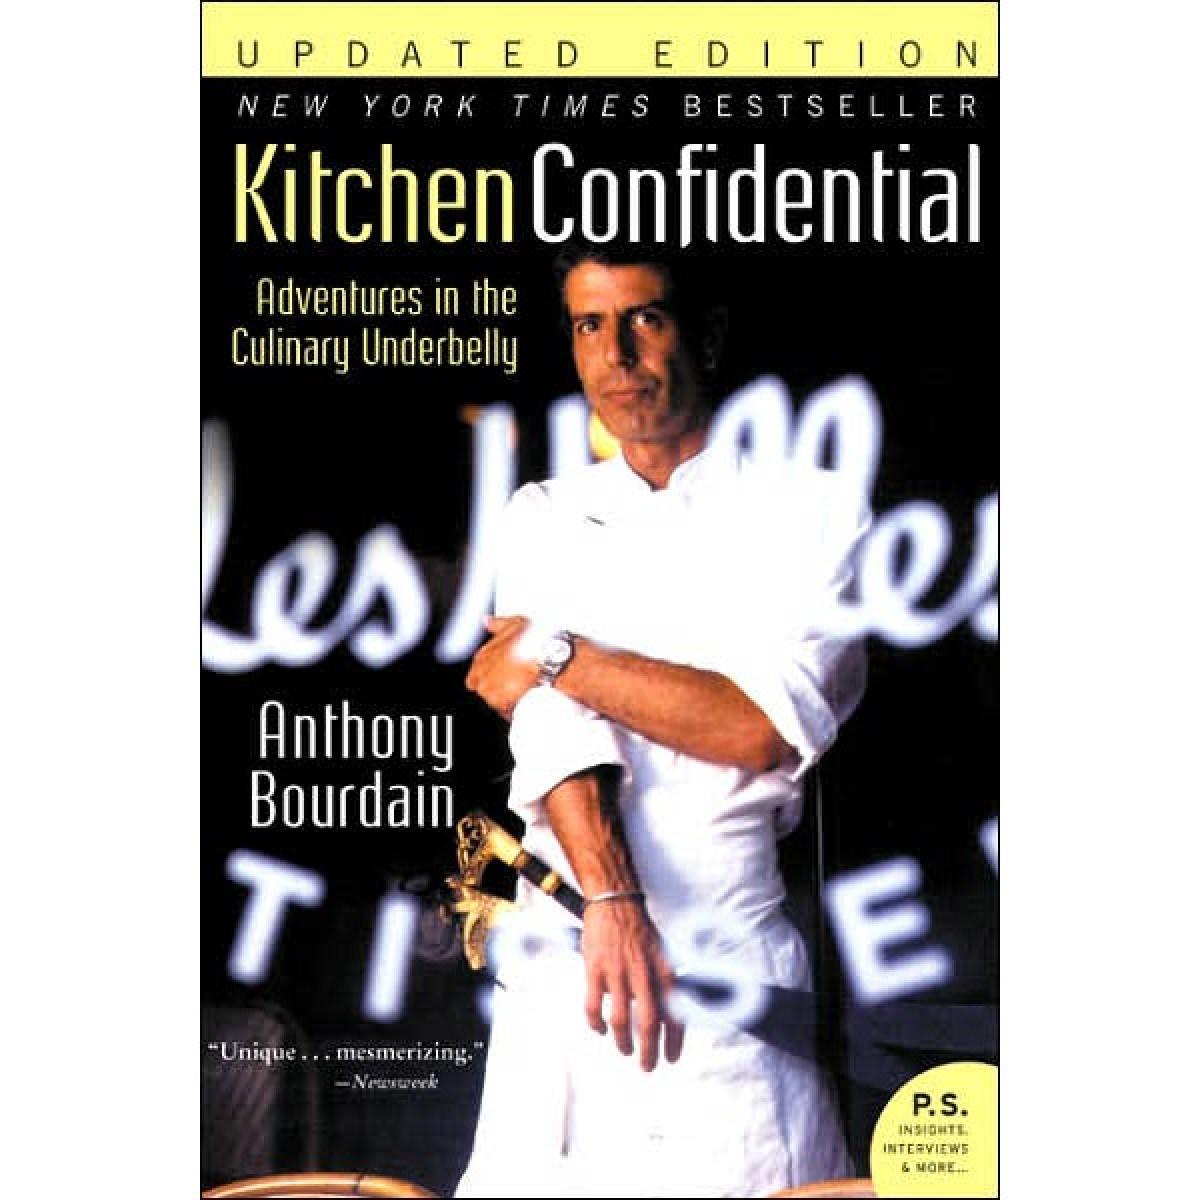 https://i2.wp.com/zenwahm.com/wp-content/uploads/2015/01/kitchen-confidential.jpg